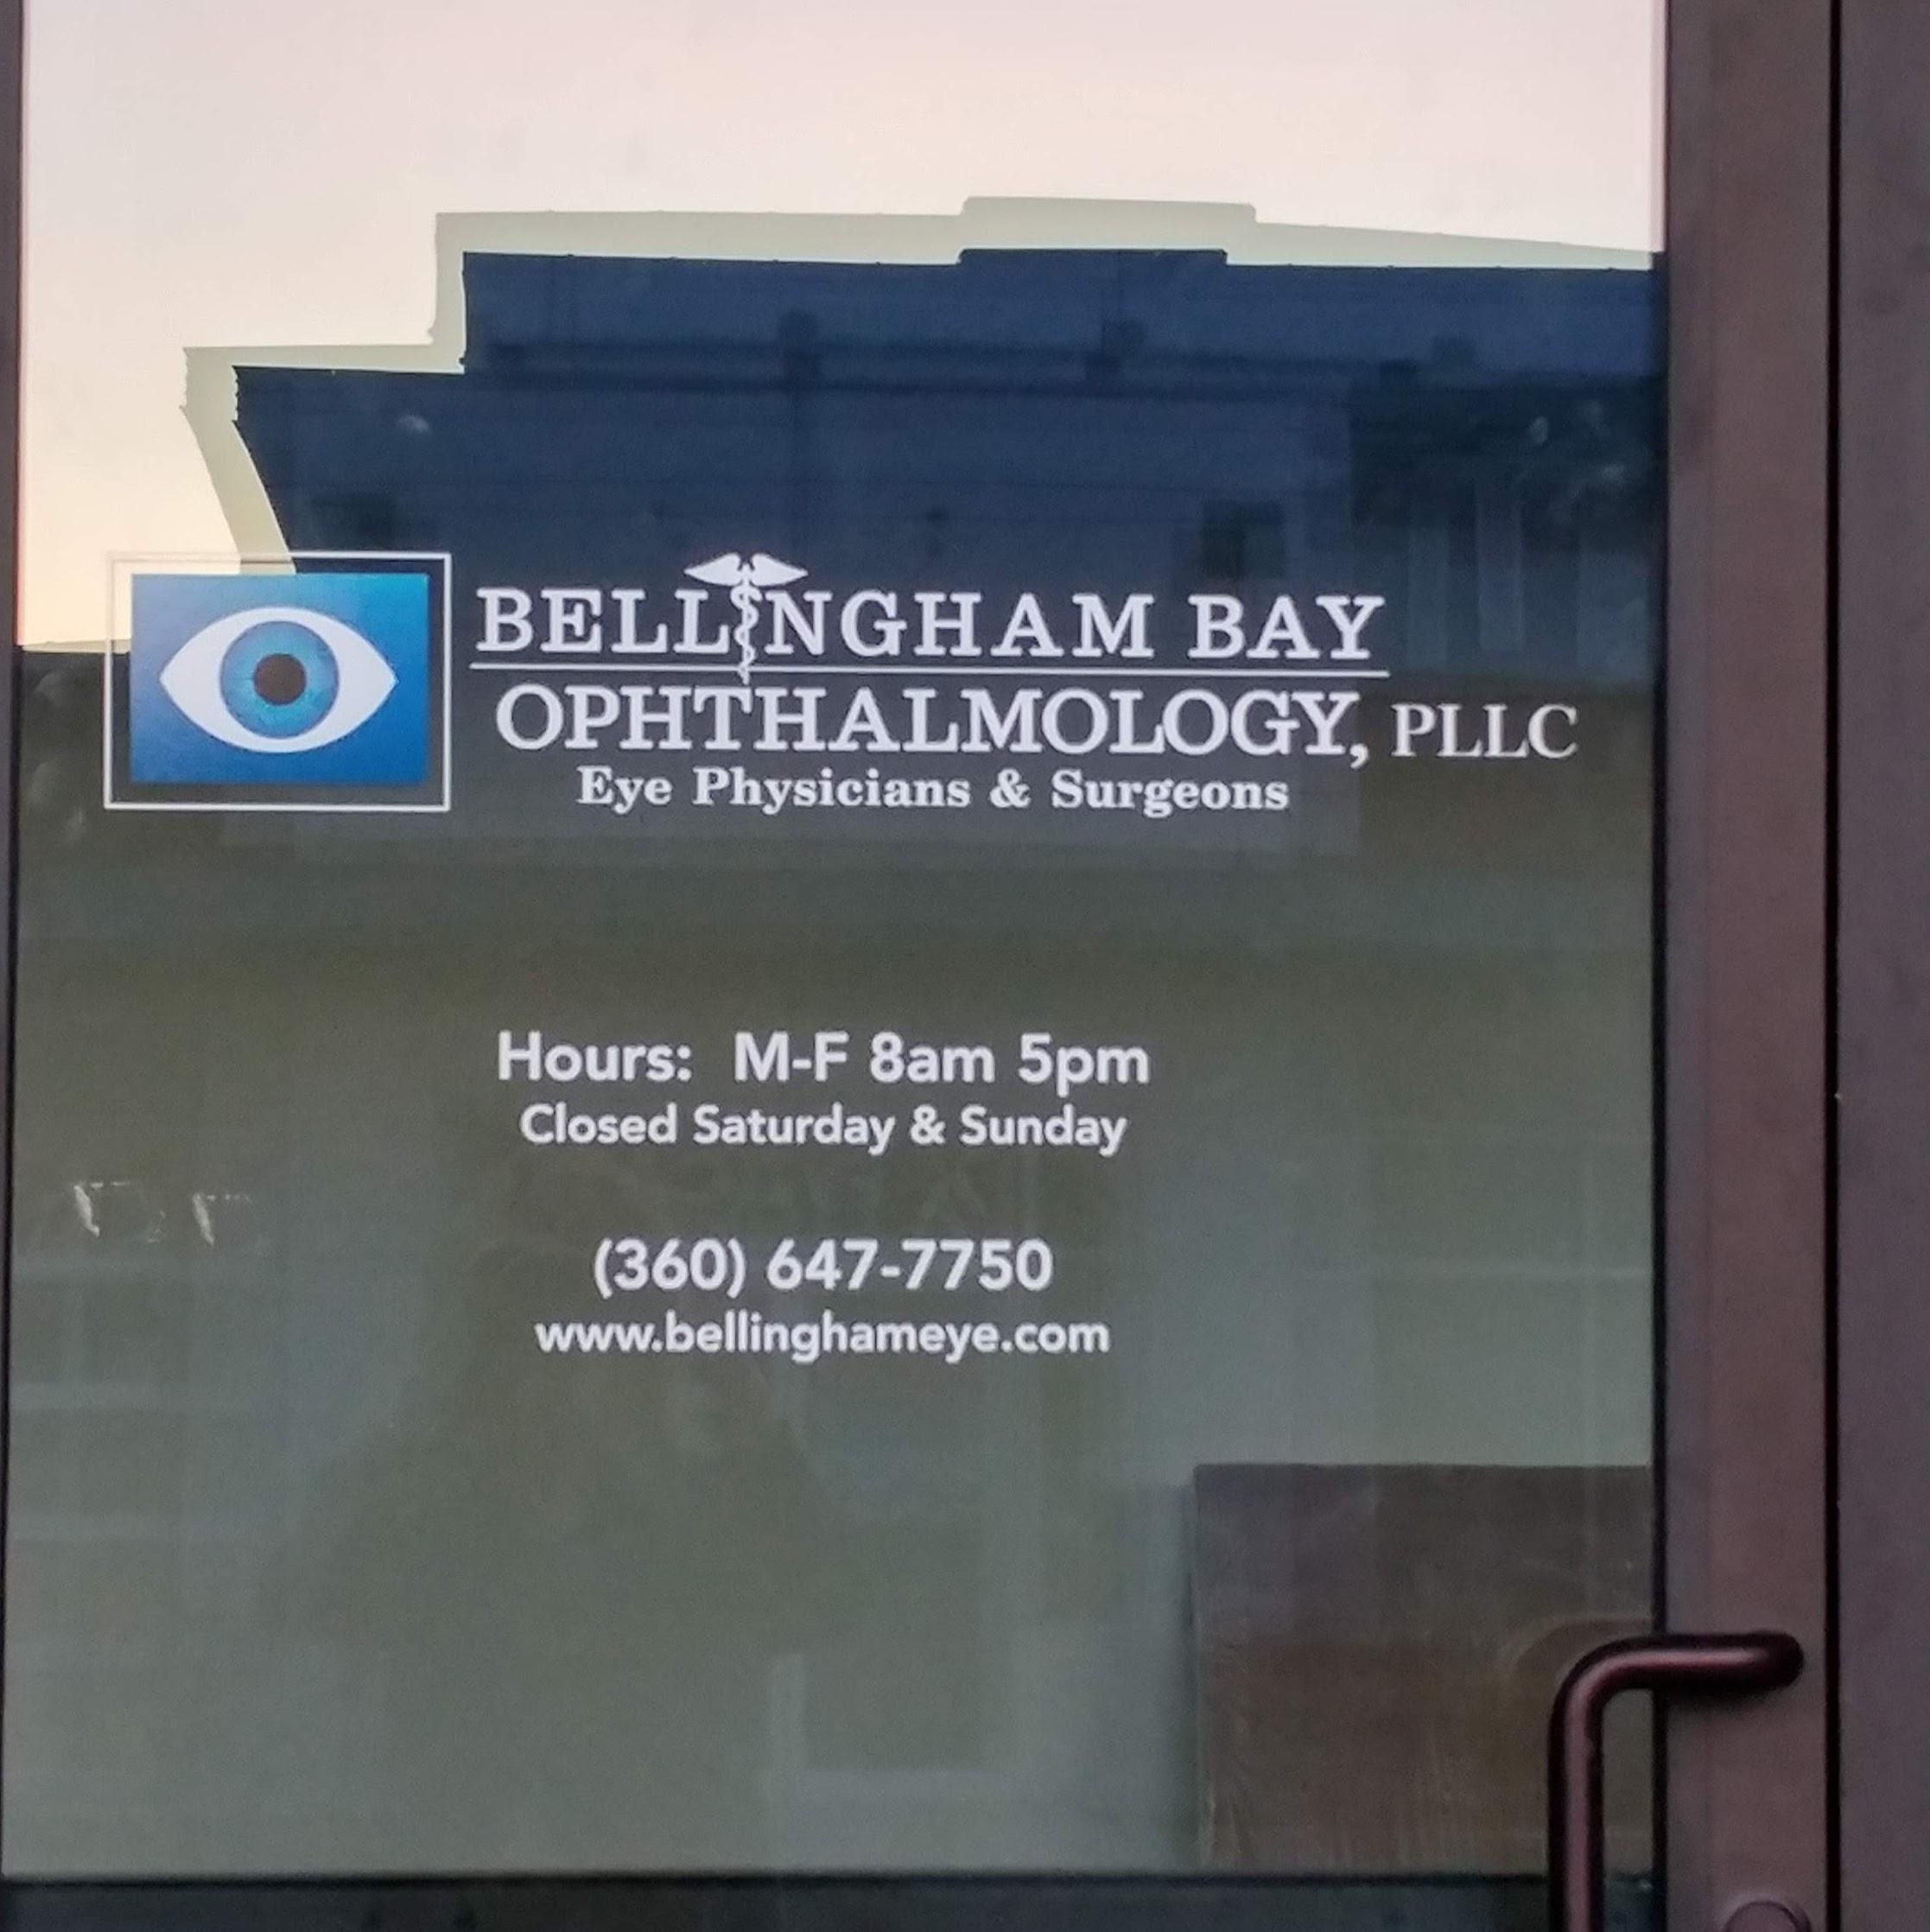 Bellingham Bay Ophthalmology PLLC: James M. Kim MD